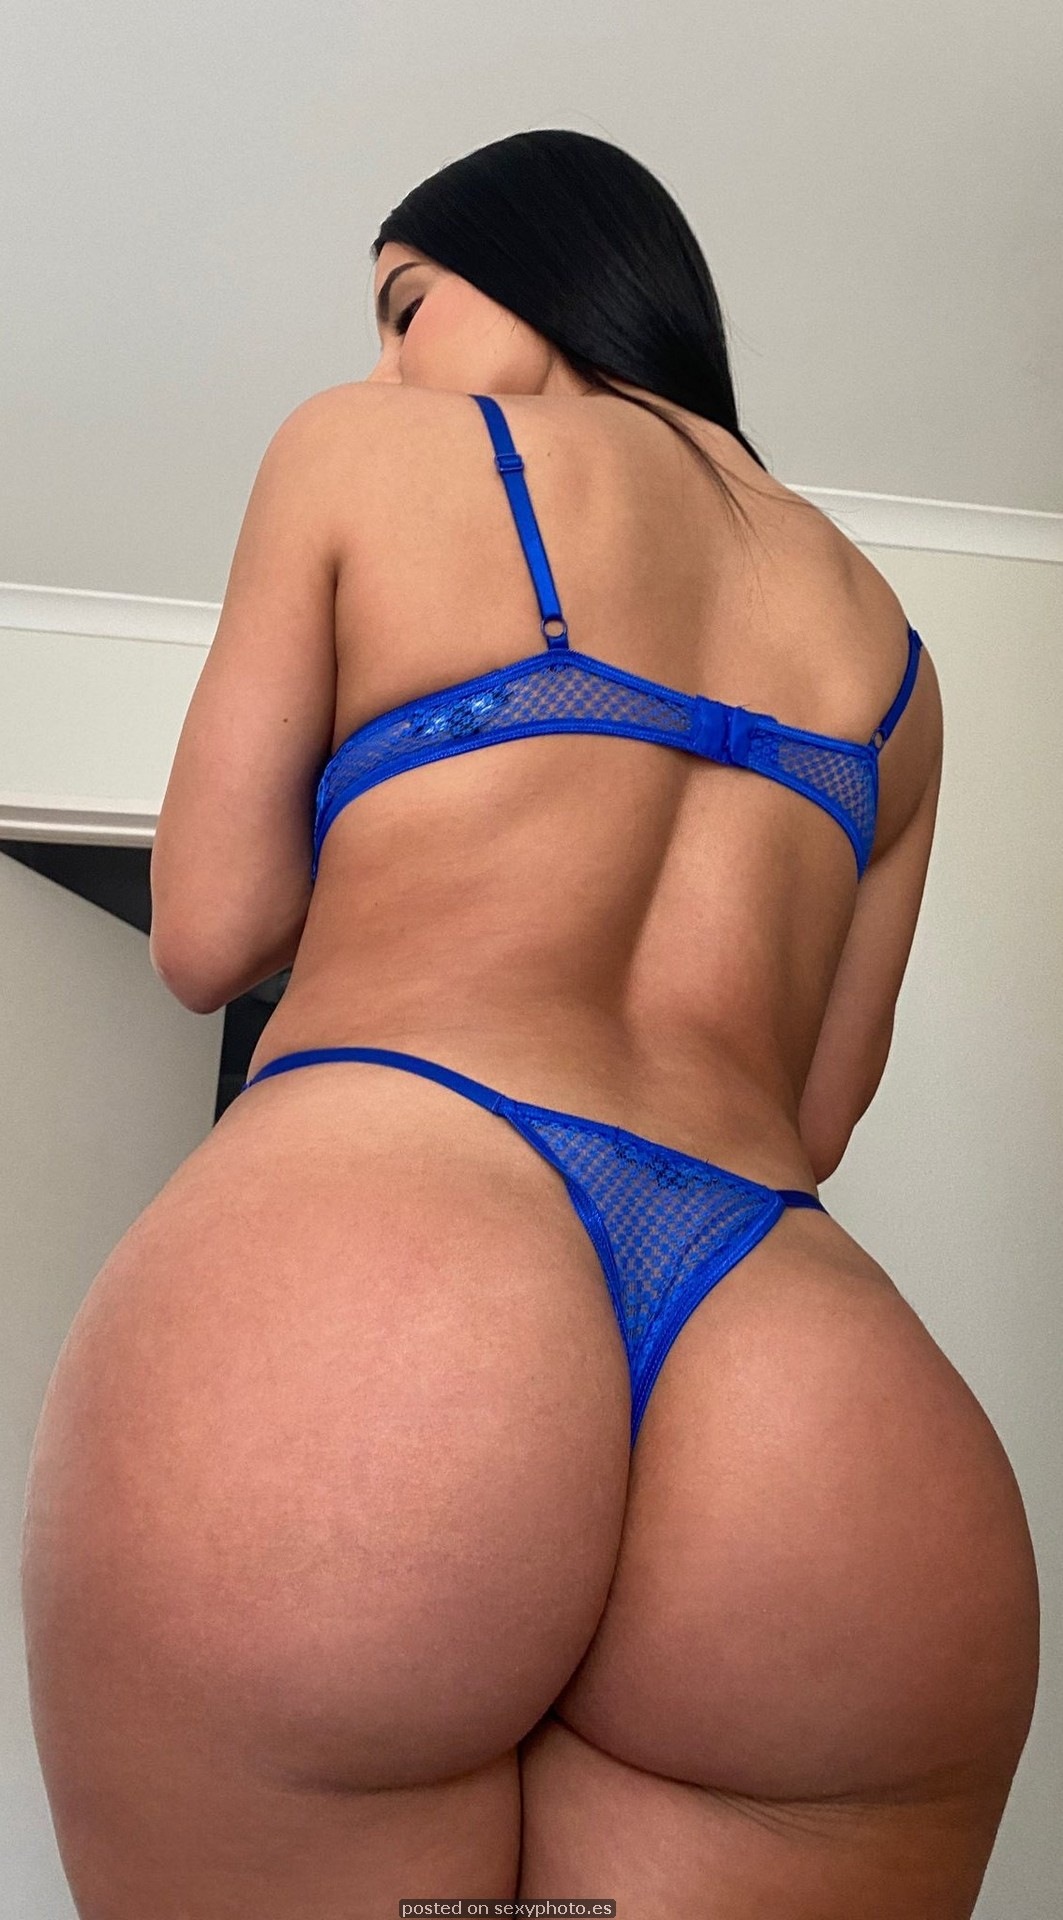 sexyphoto-special ass- especial culos-culos sexis-sexy ass_